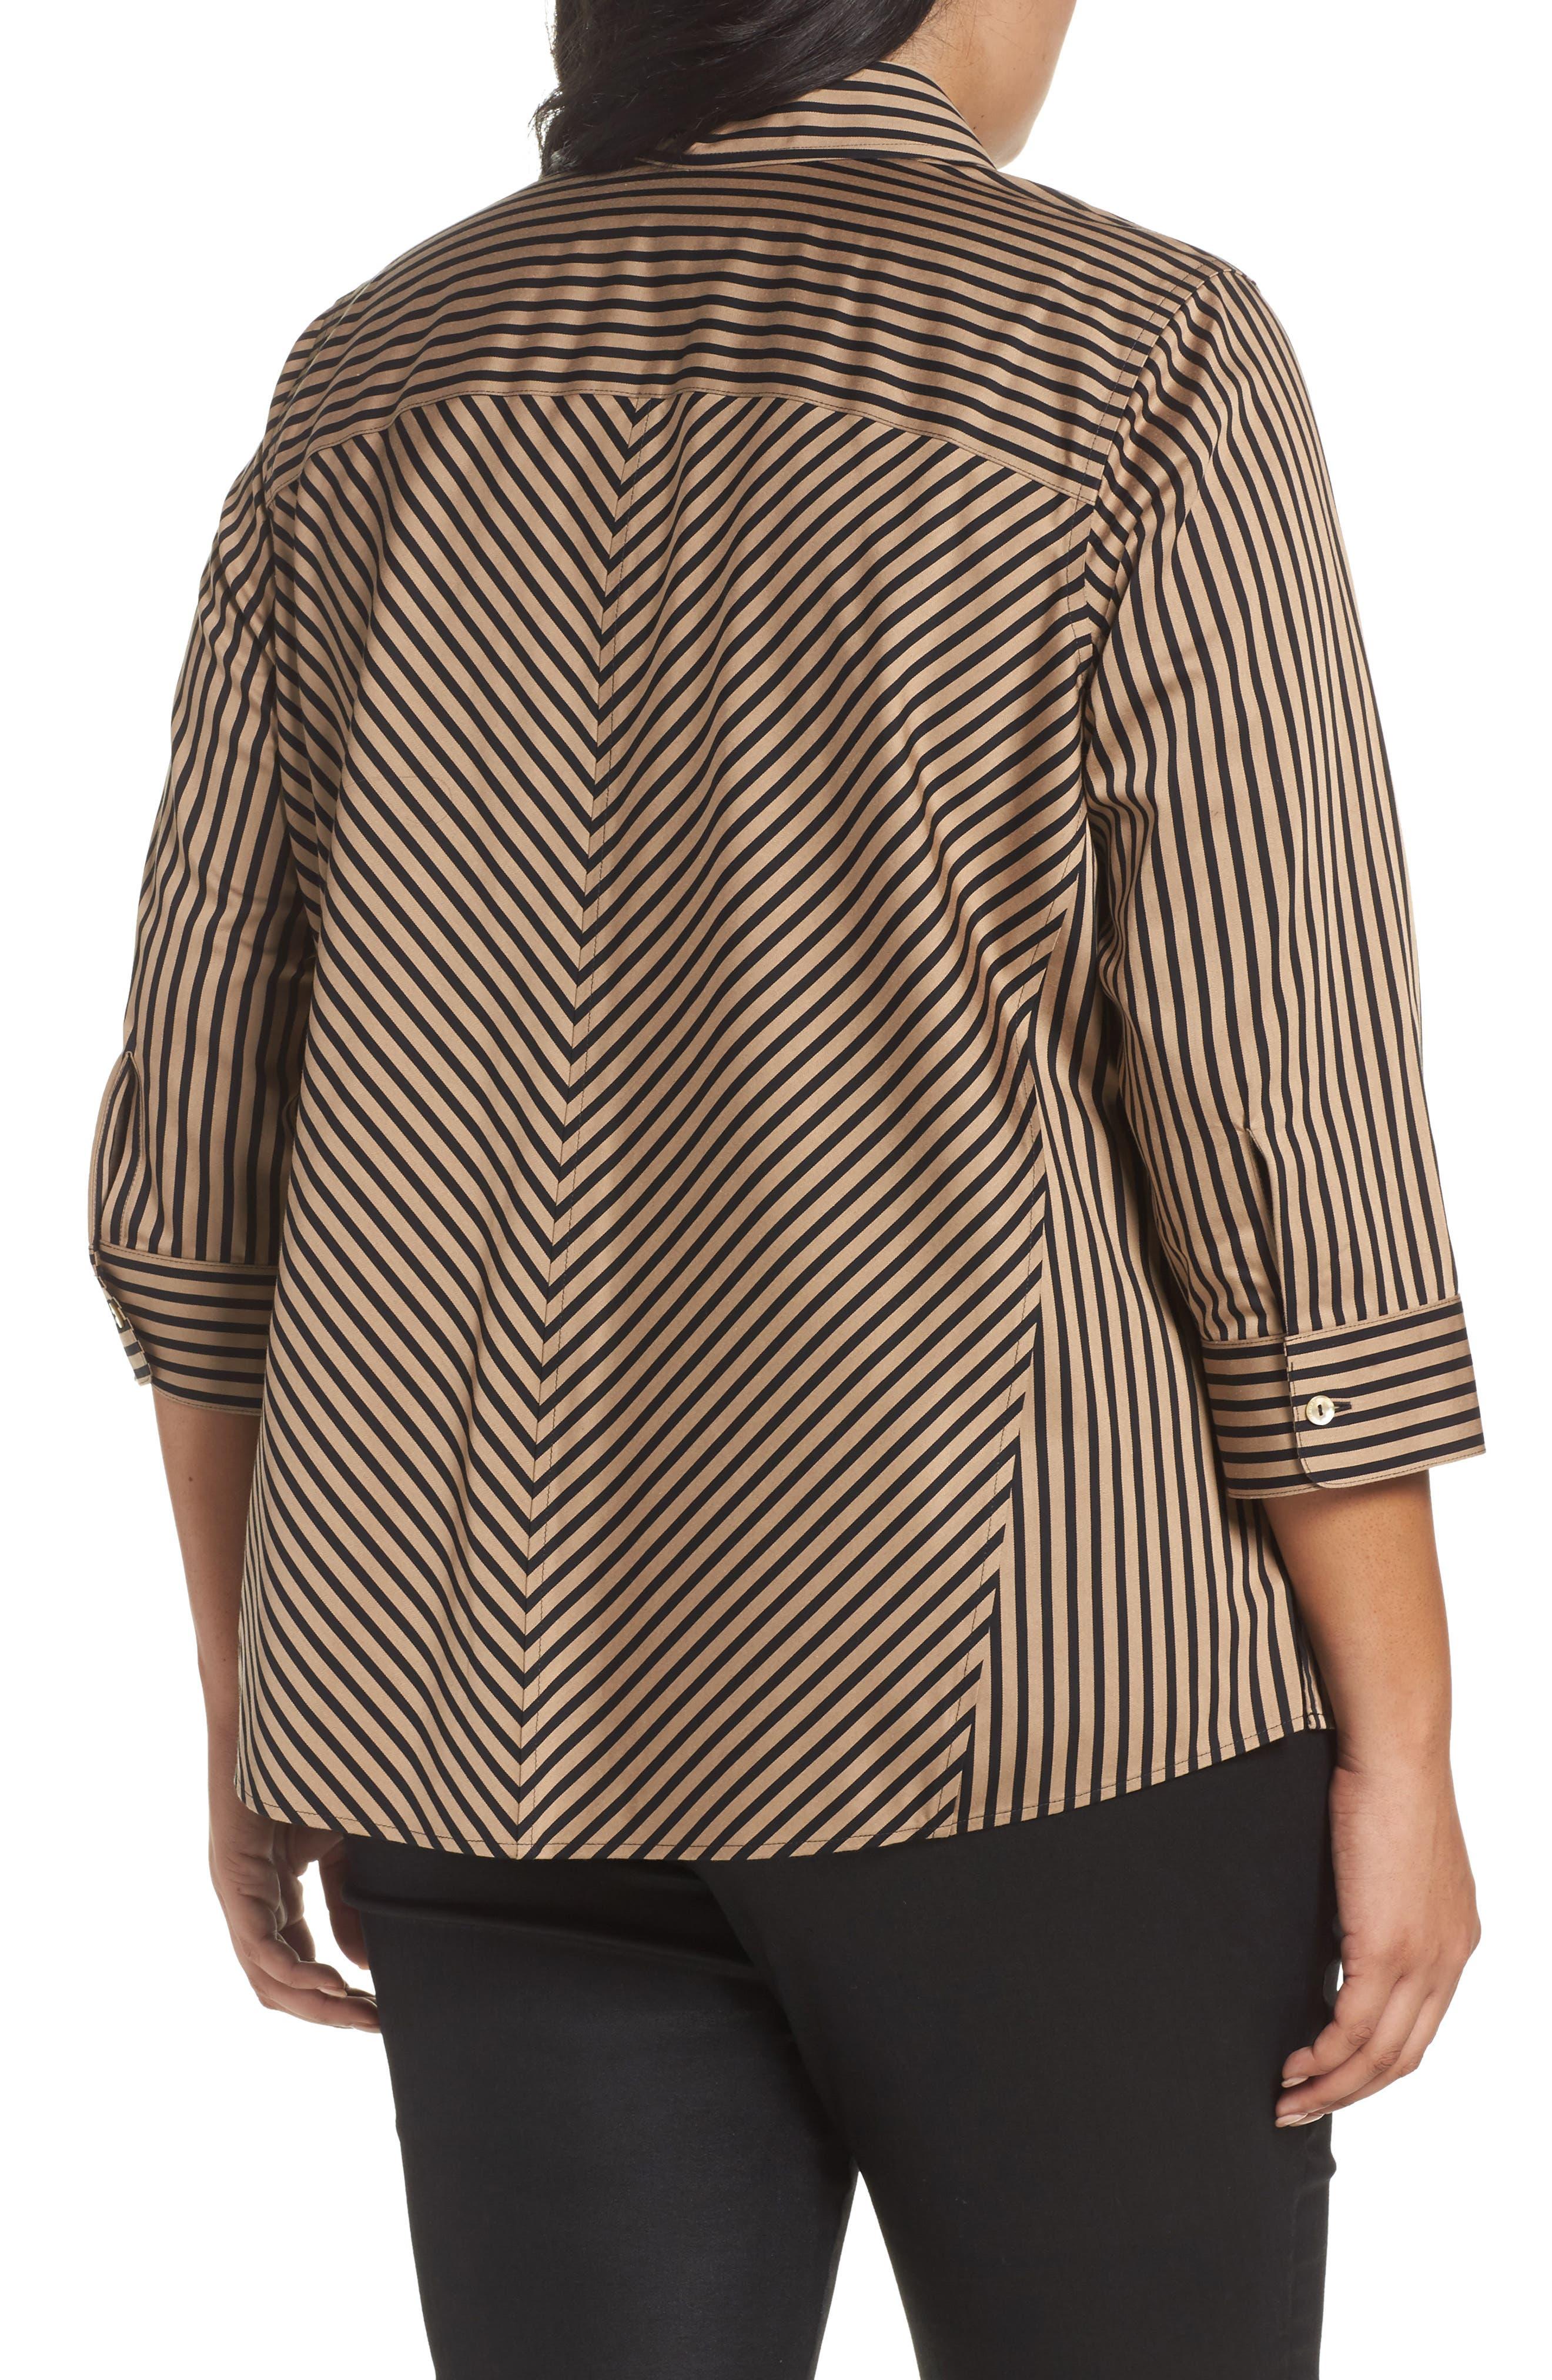 Alternate Image 2  - Foxcroft Fallon Satin Stripe Cotton Shirt (Plus Size)